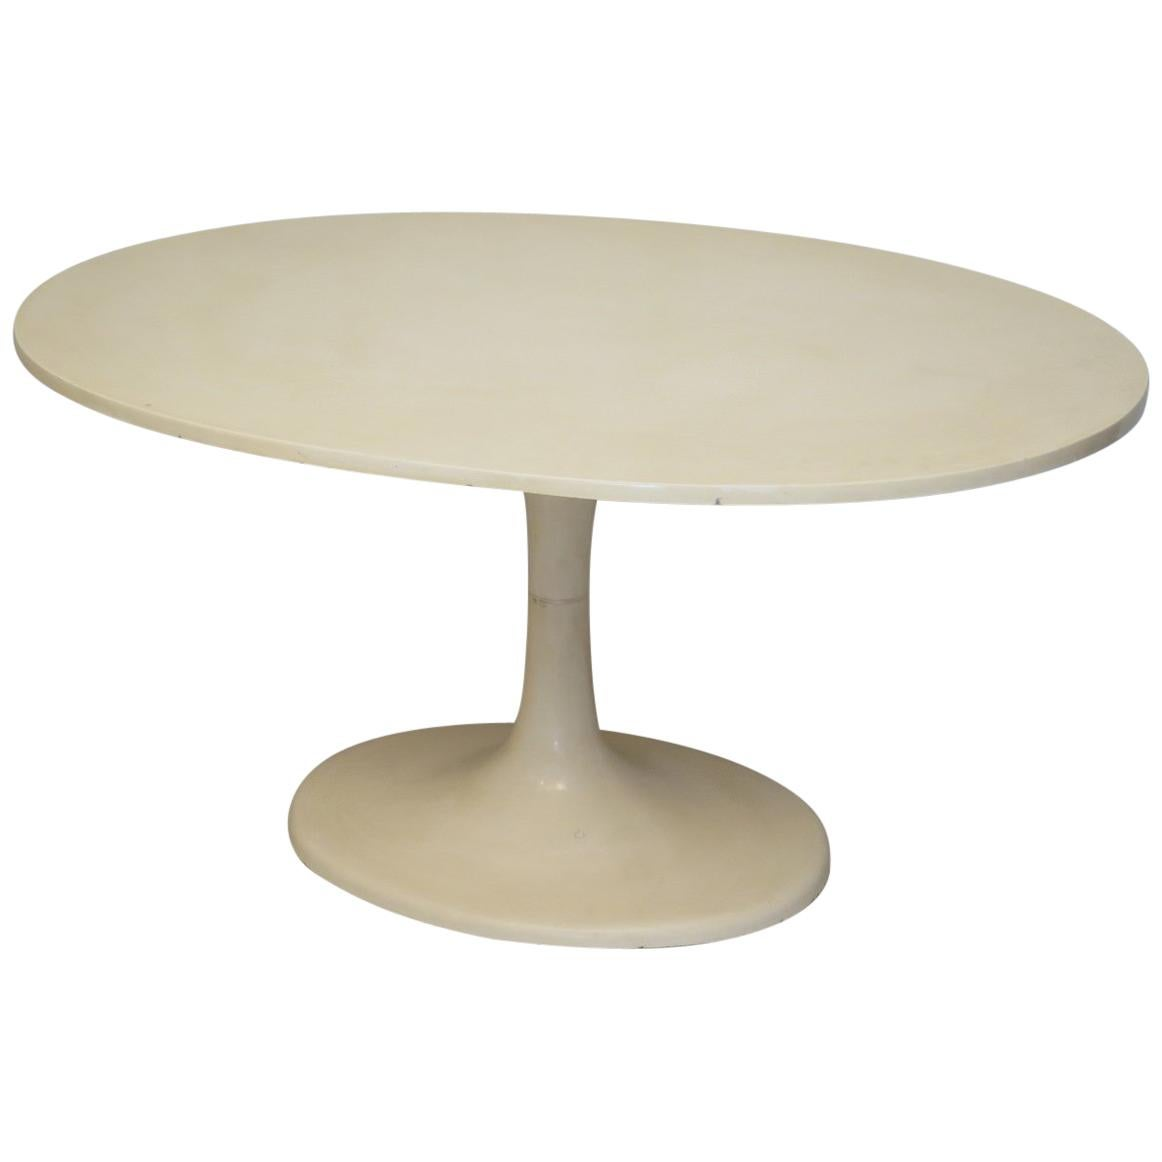 Tulip Oval Table, 1970